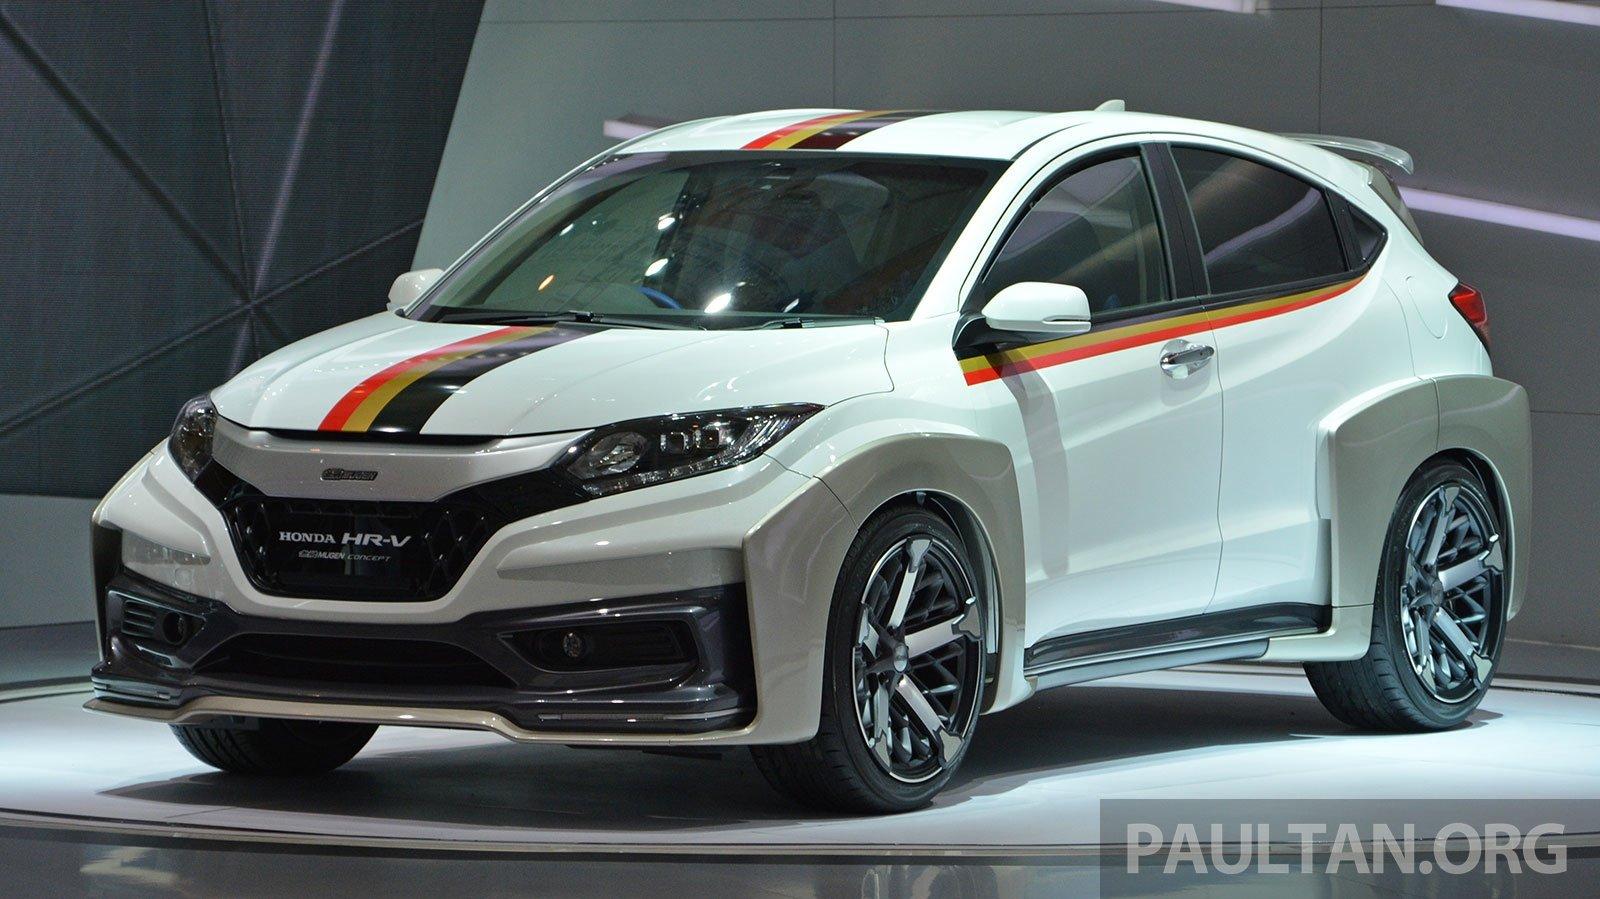 Honda Hr V Modulo >> IIMS 2014: Honda HR-V Mugen and Modulo live gallery Paul Tan - Image 273159